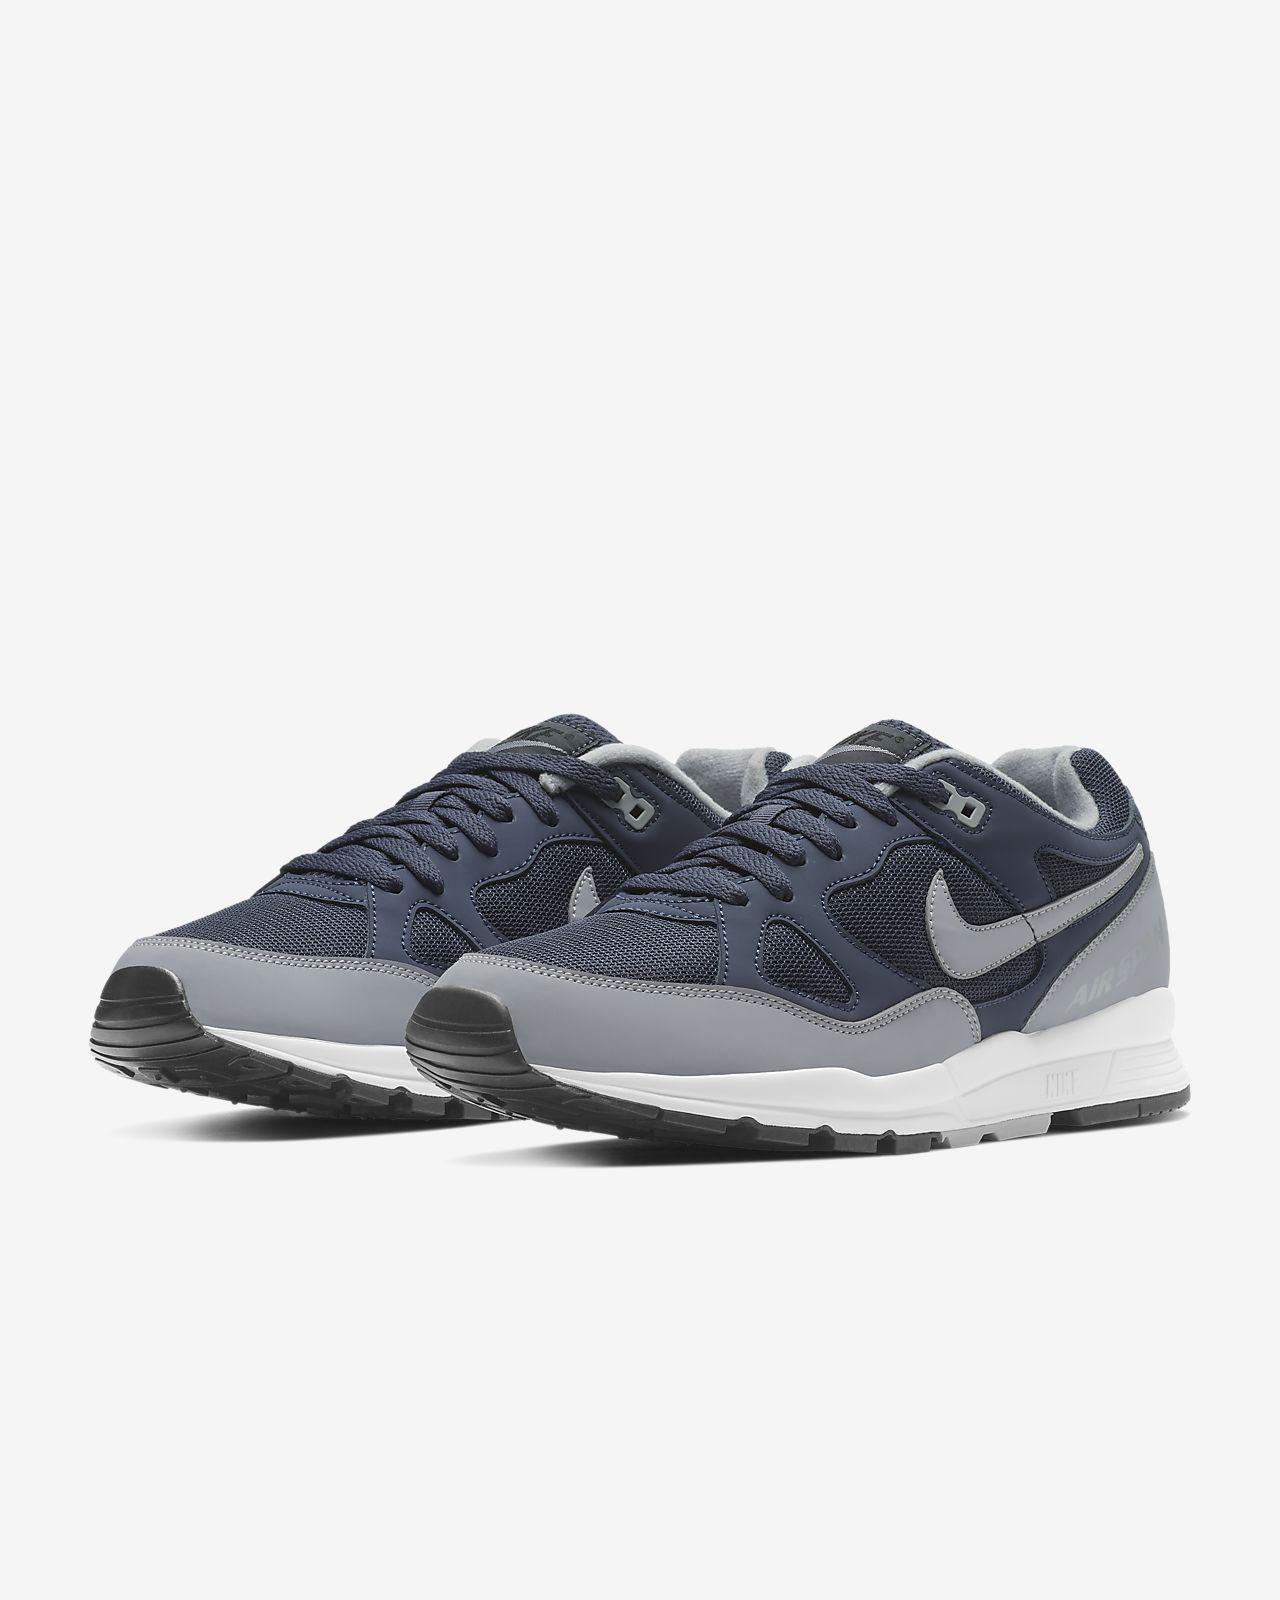 61c427762d8a Nike Air Span II Men s Shoe. Nike.com